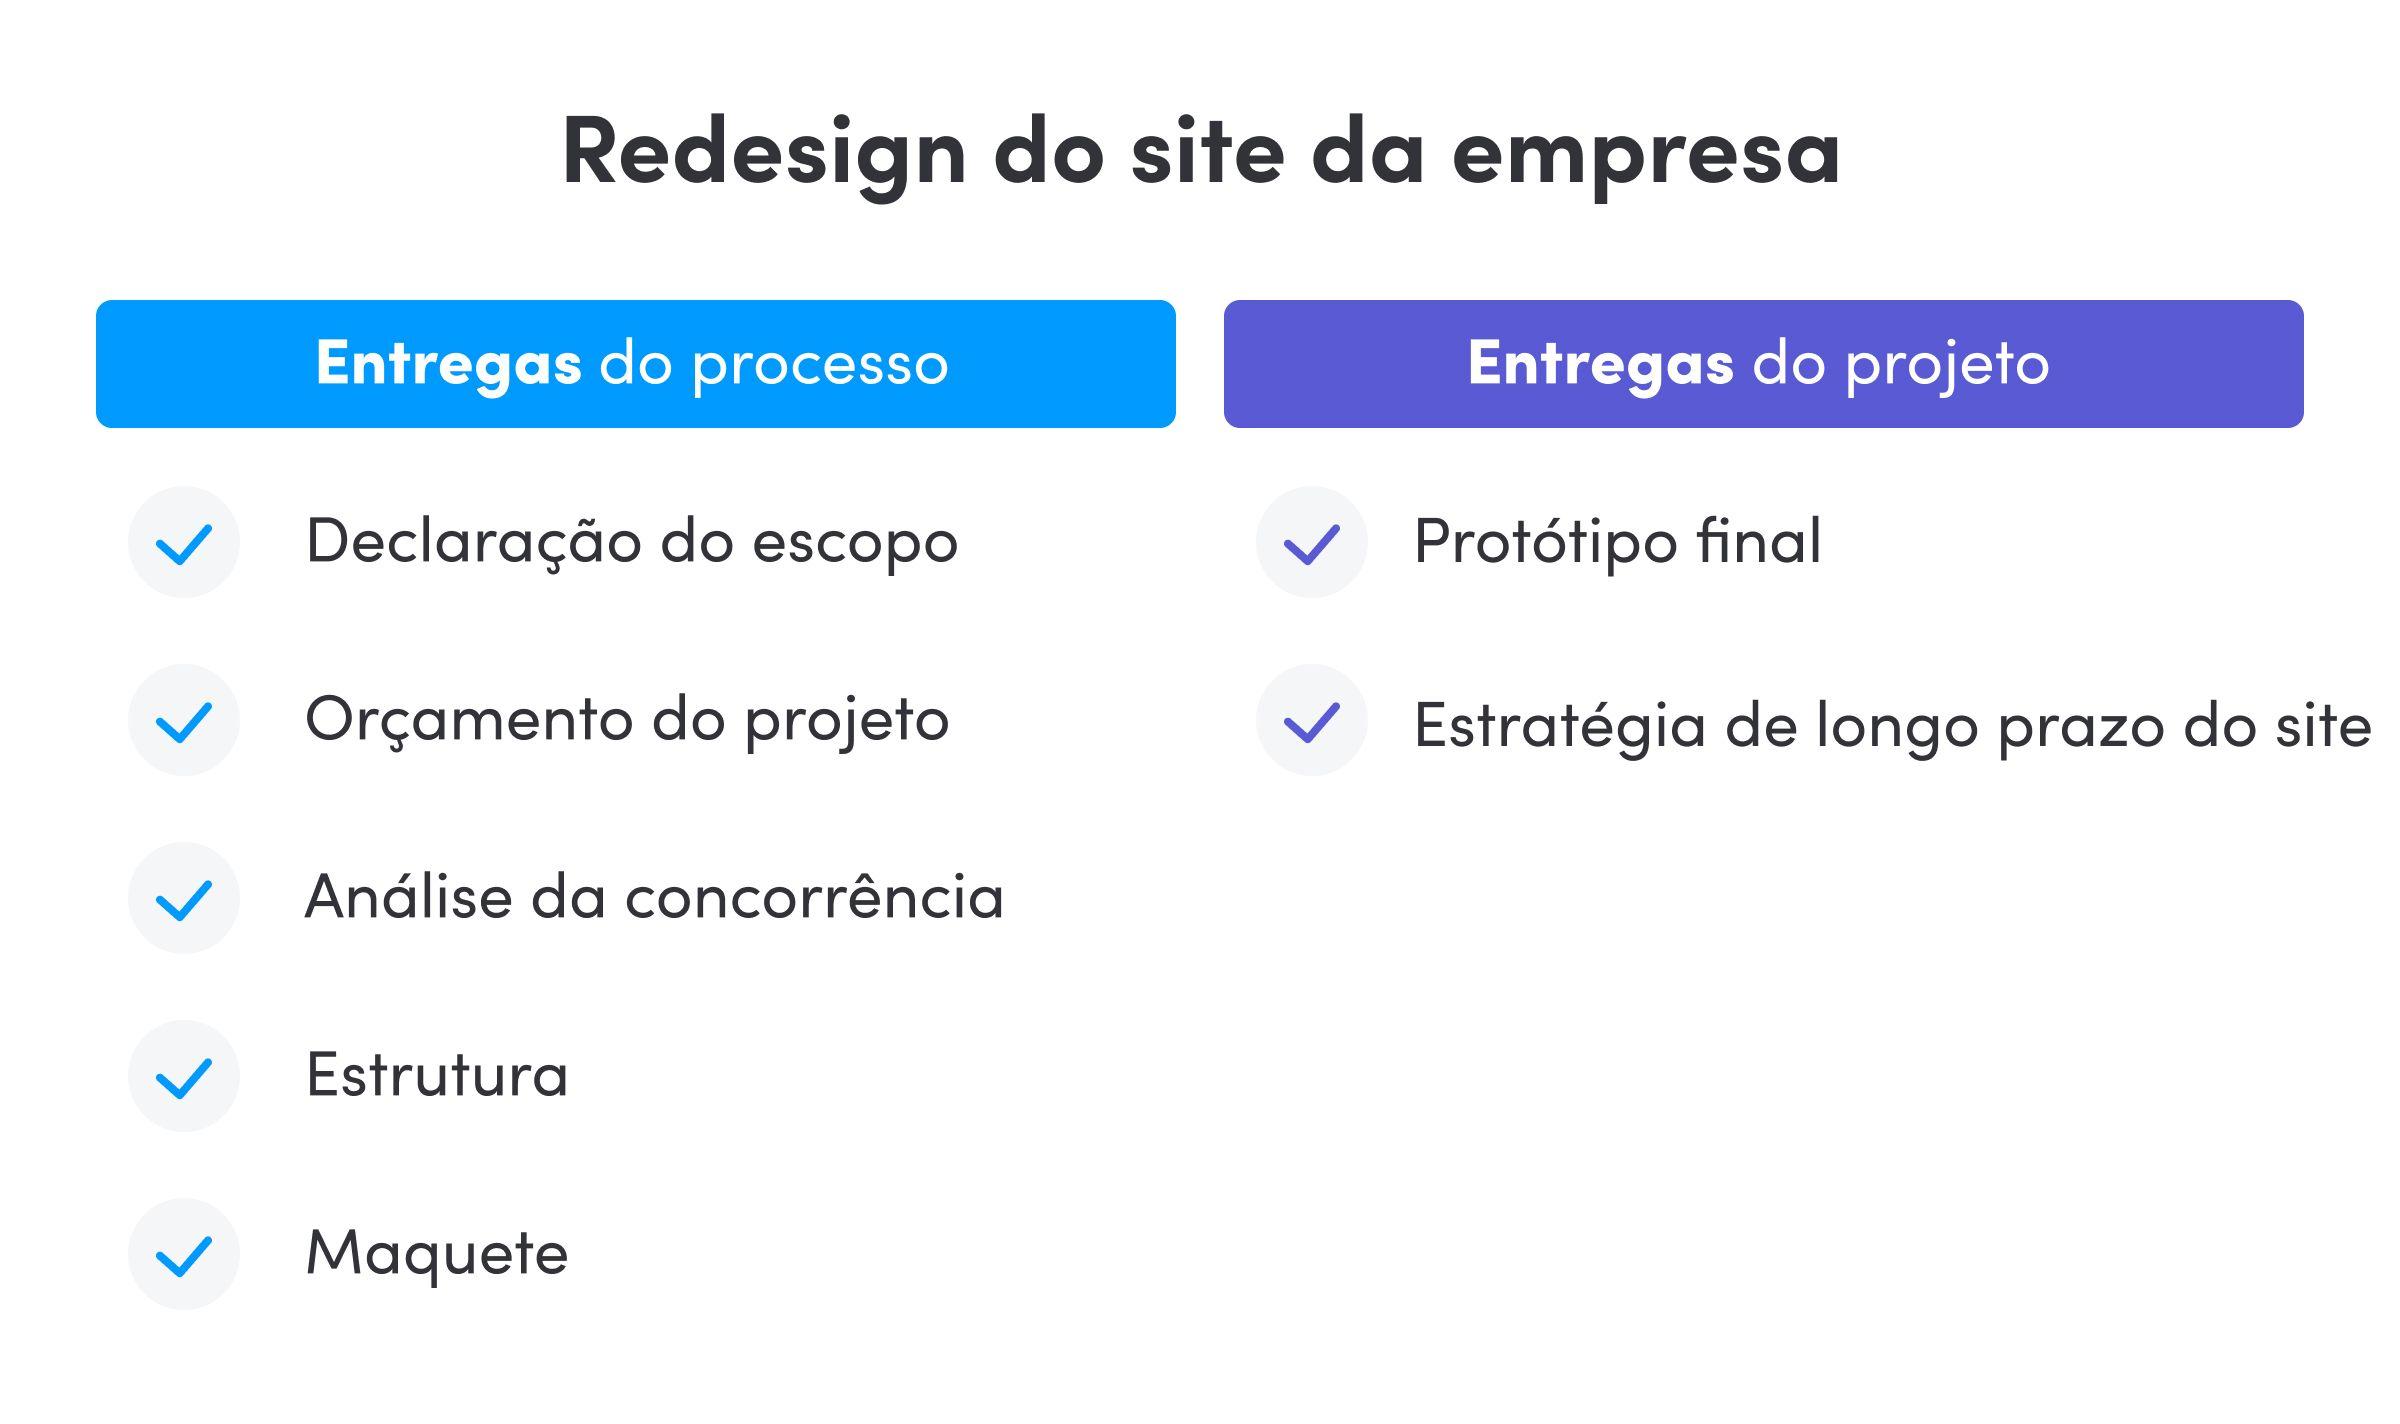 Exemplos de entregas de projeto